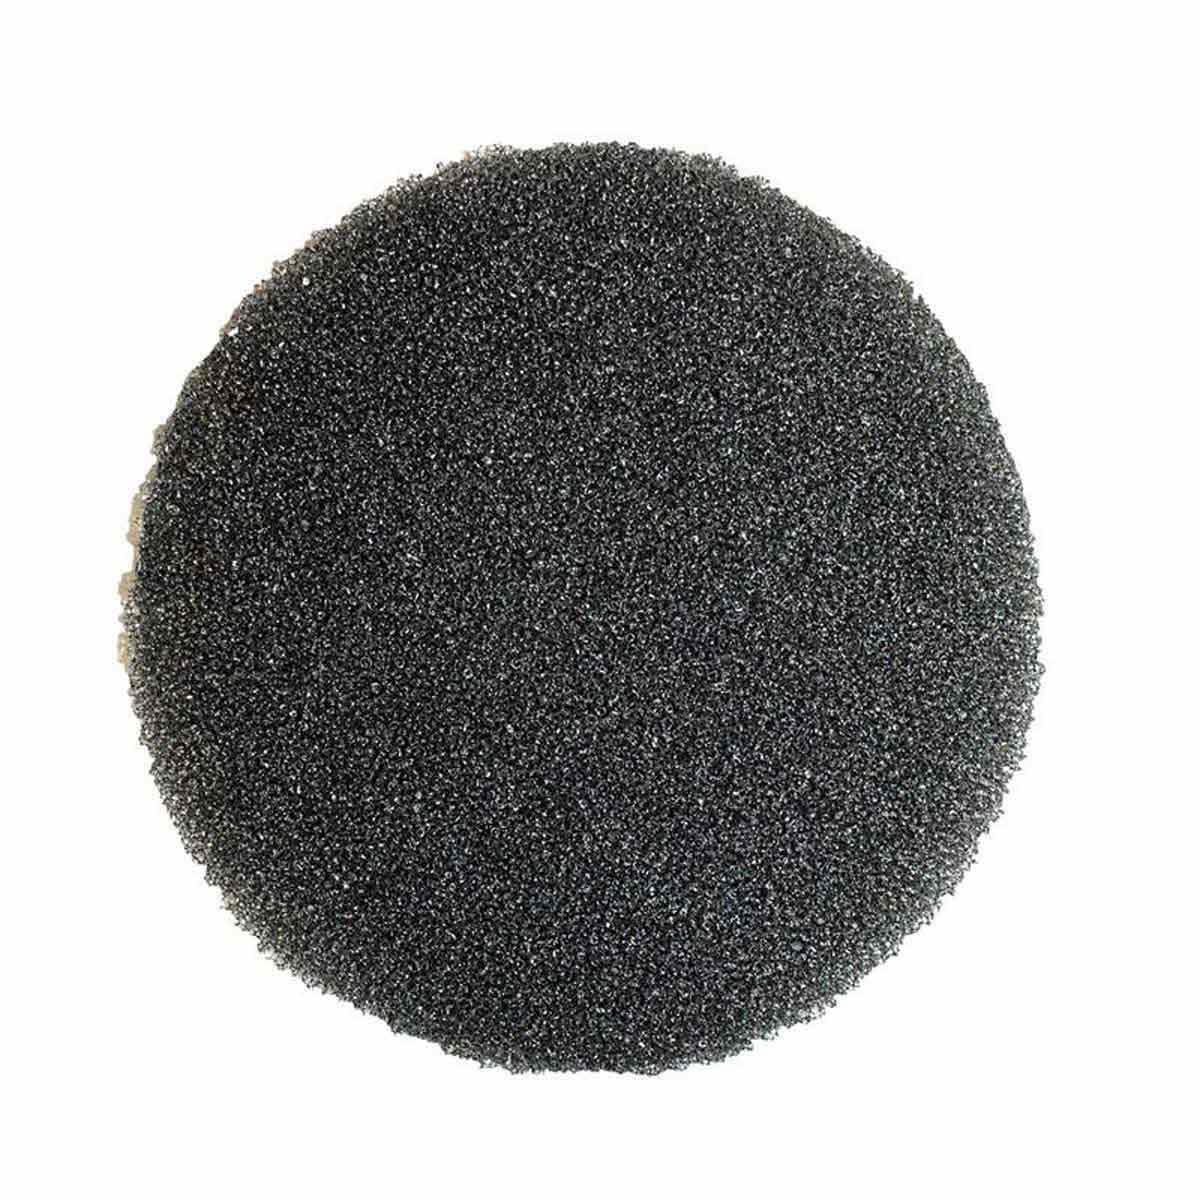 Challengair Portable Dryer Filter